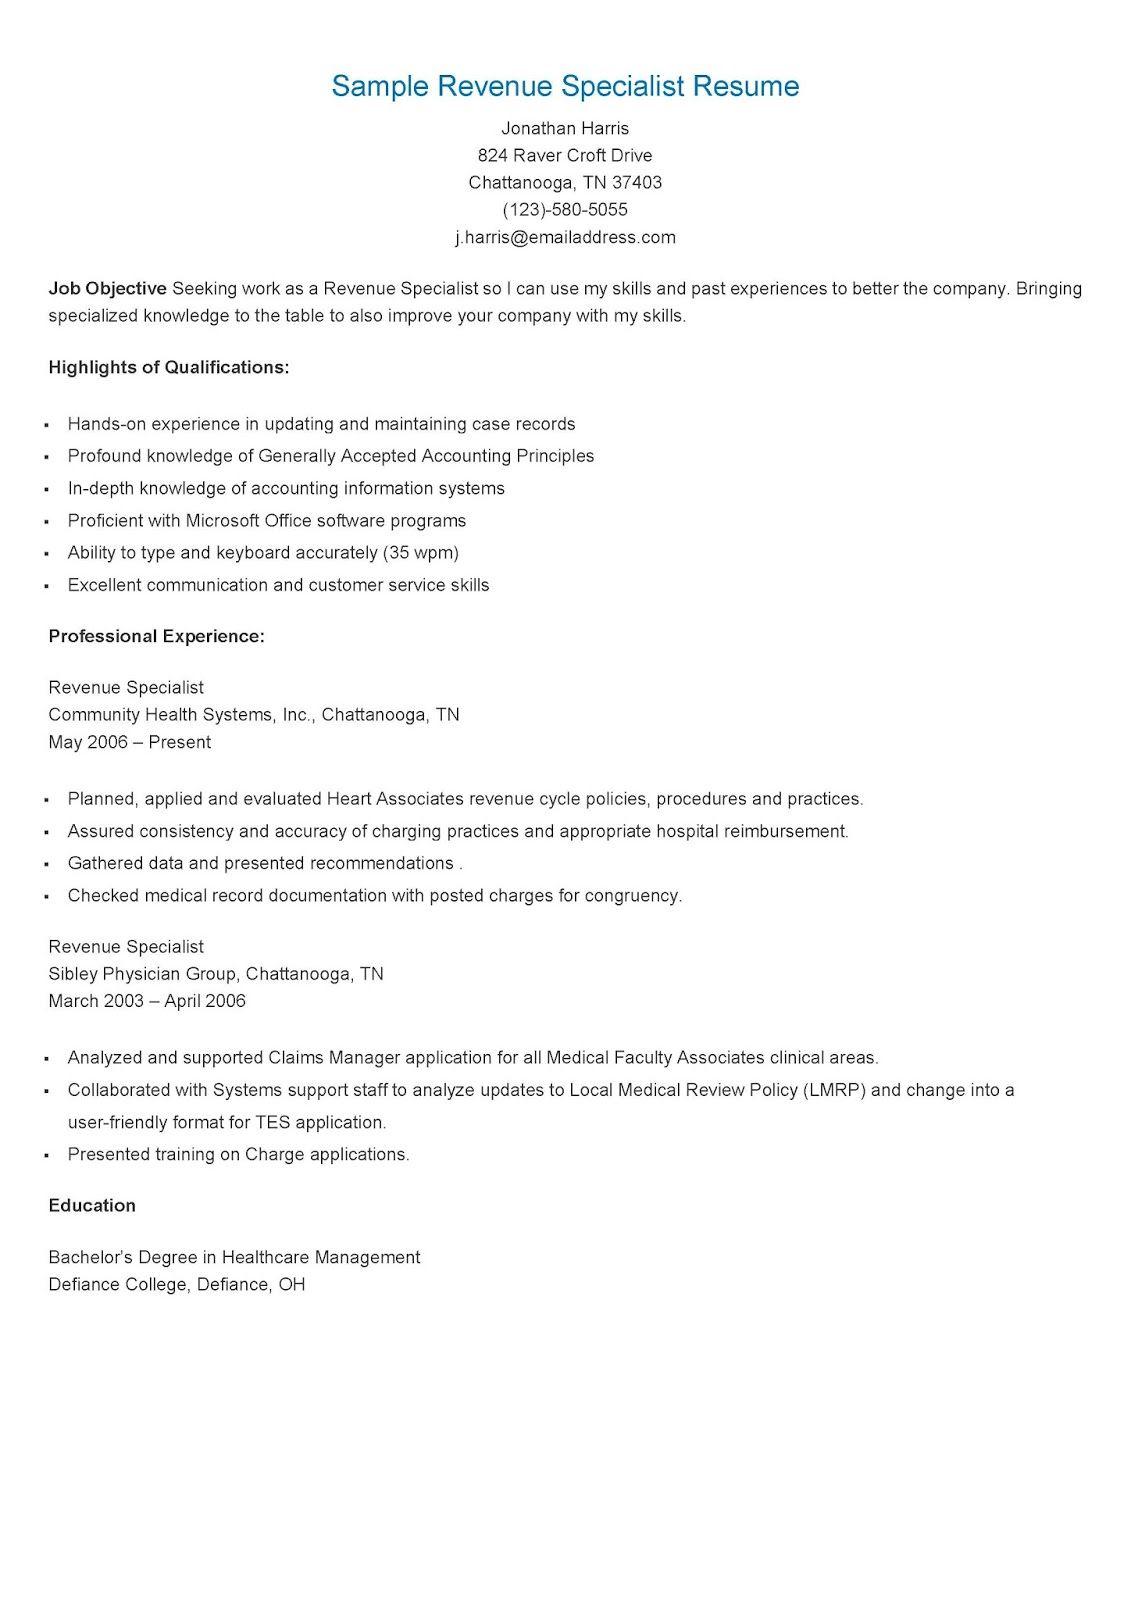 Sample Revenue Specialist Resume Sample resume format